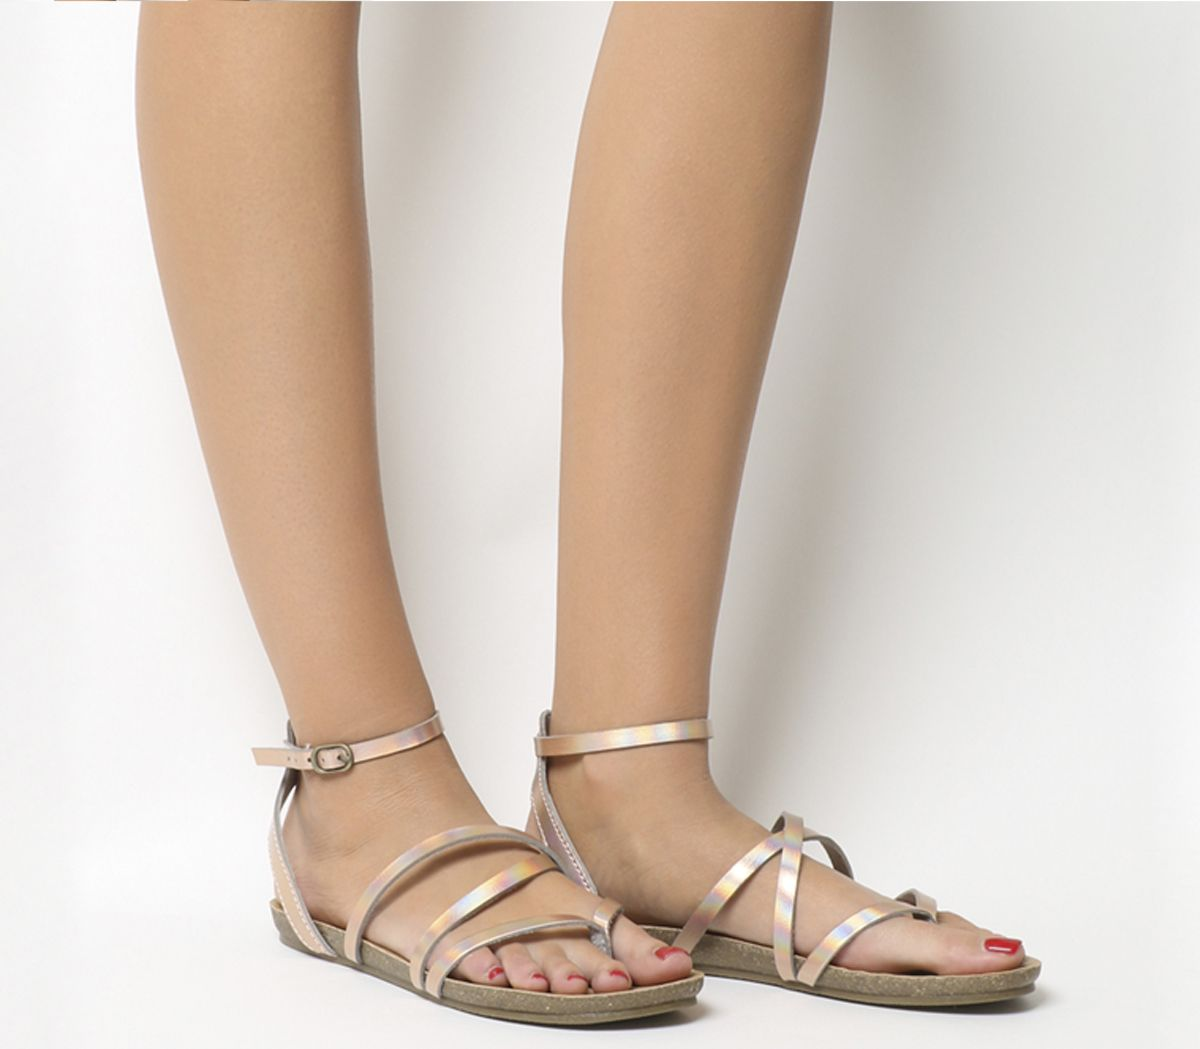 7b52abf373a7 Blowfish Galaway Sandals Solar Pisa - Sandals